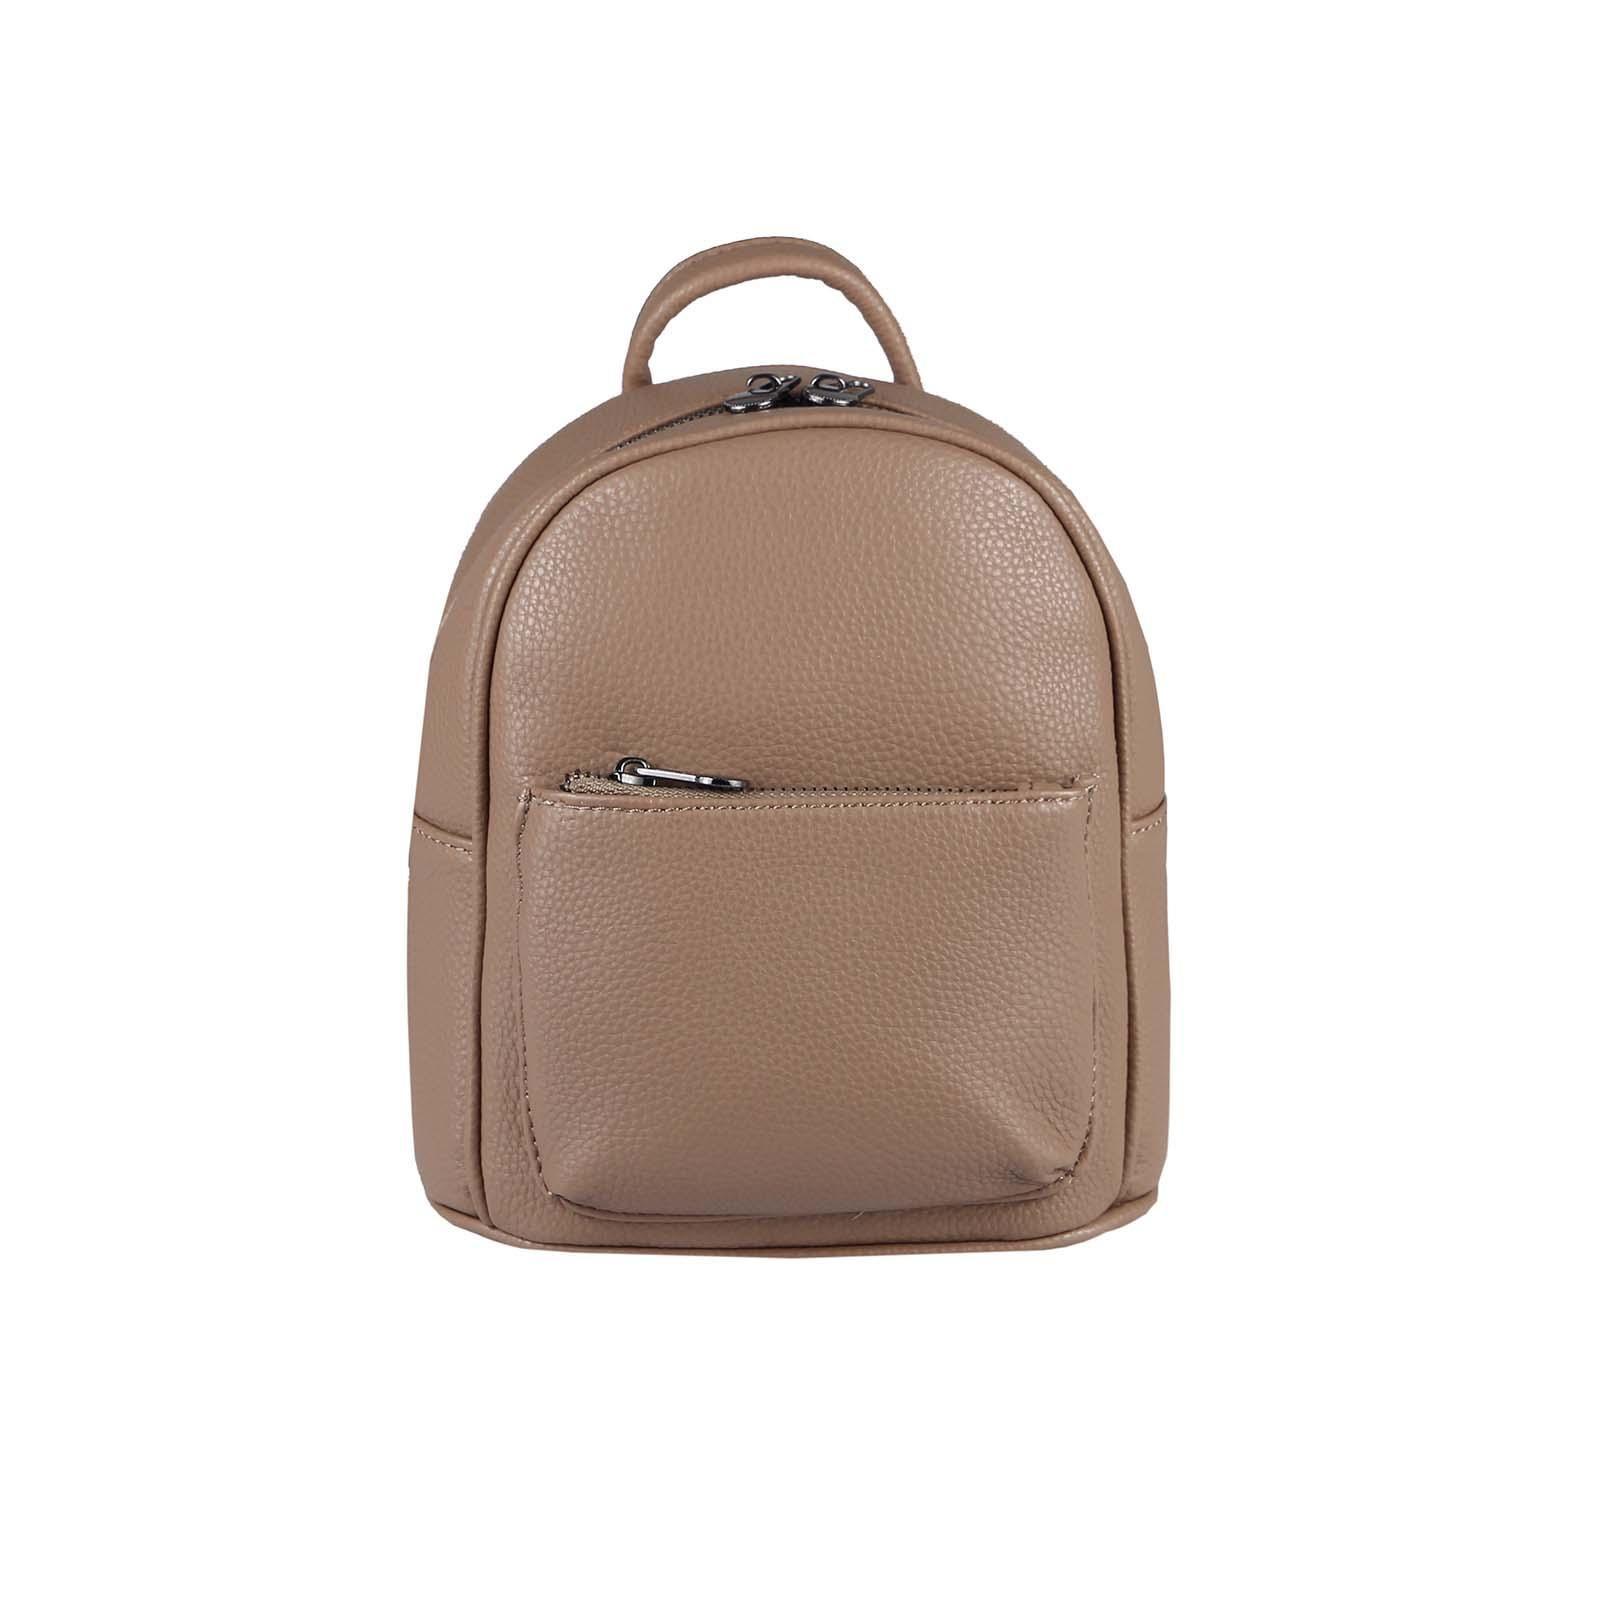 Damen Vintage Leder Rucksack Reisetasche Laptop